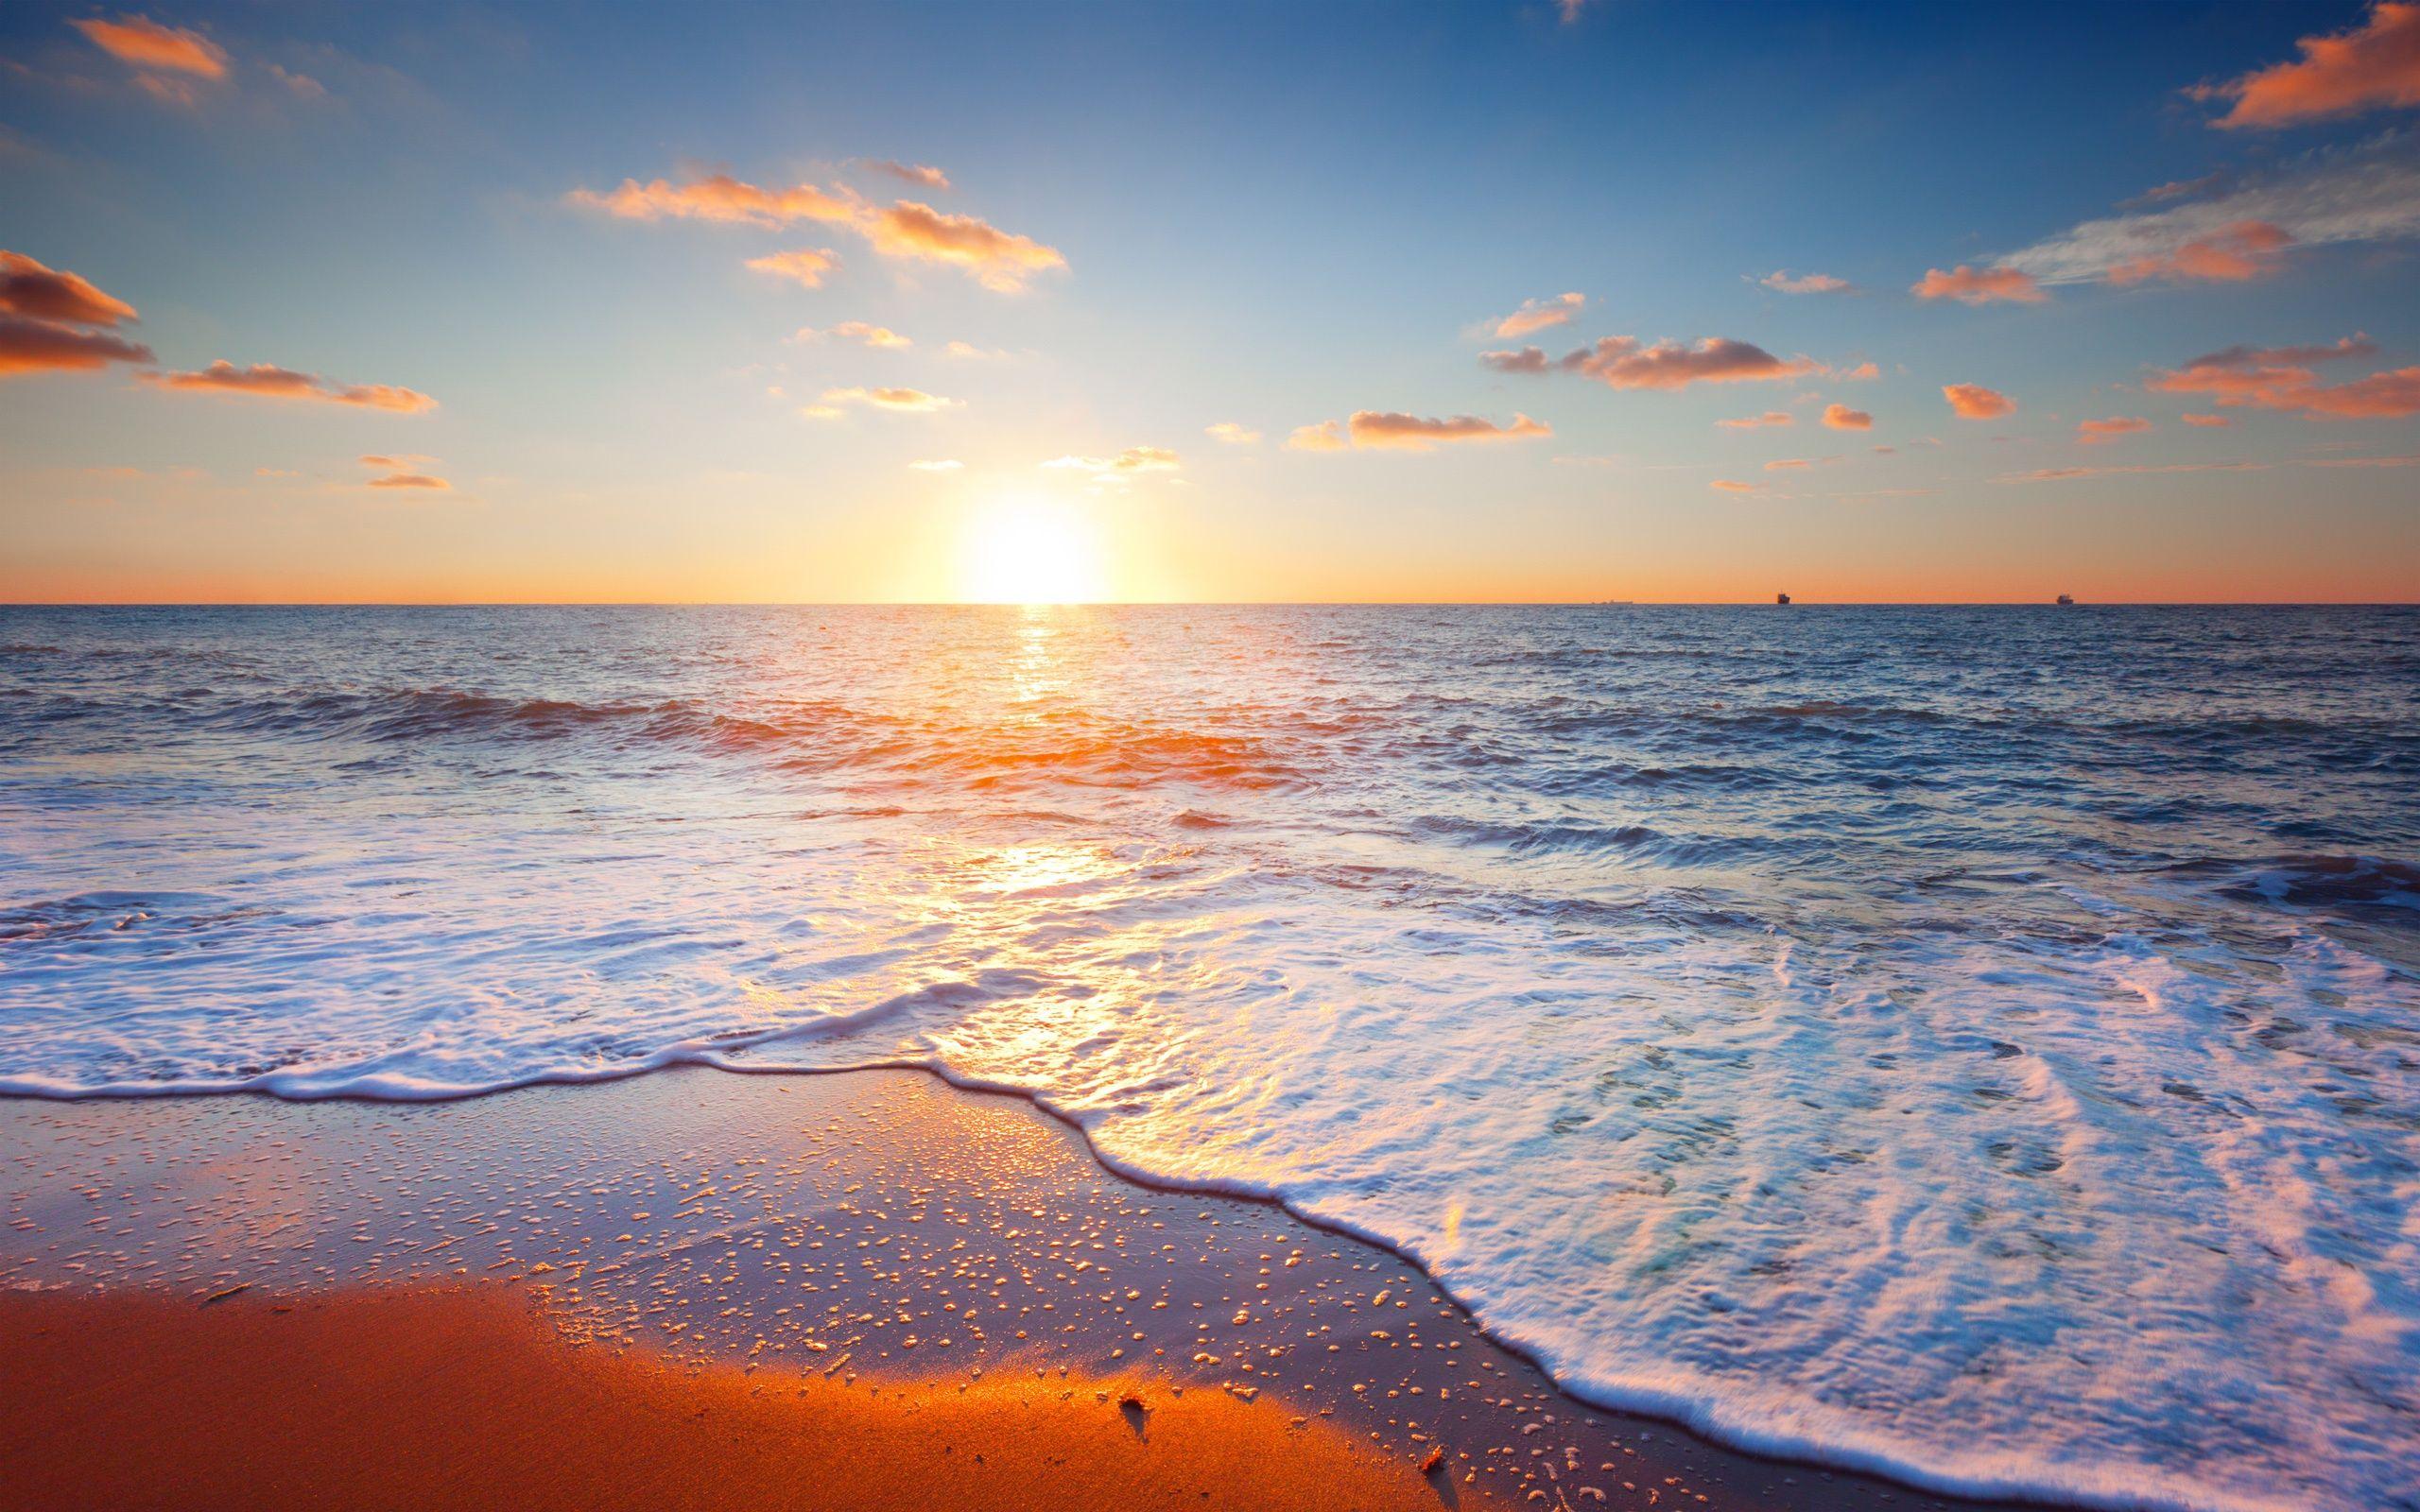 Beautiful sunset scenery, sea, sky, clouds, beach, waves